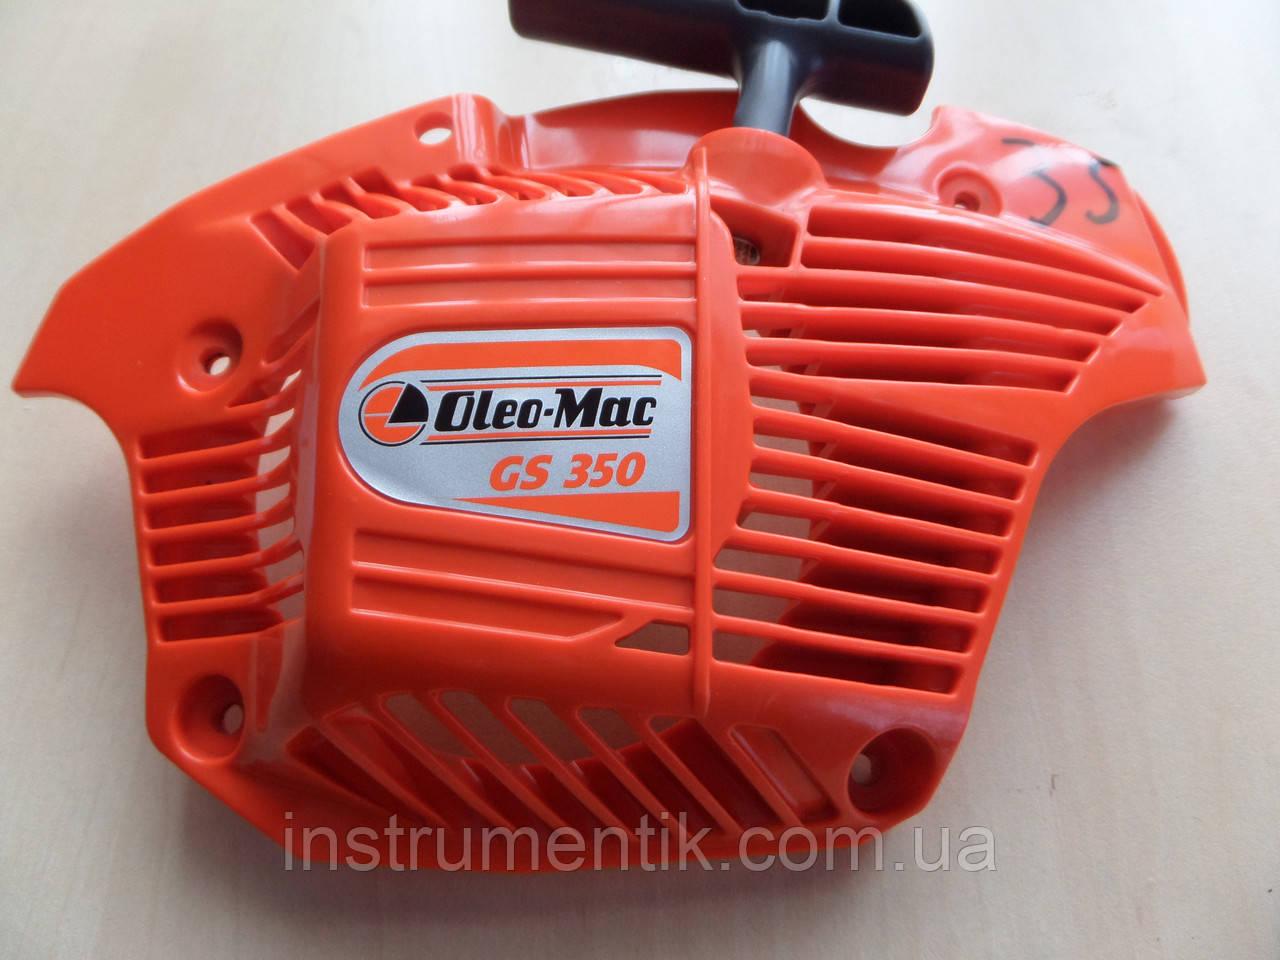 Стартер для бензопилы Oleo-Mac GS 35, GS 350